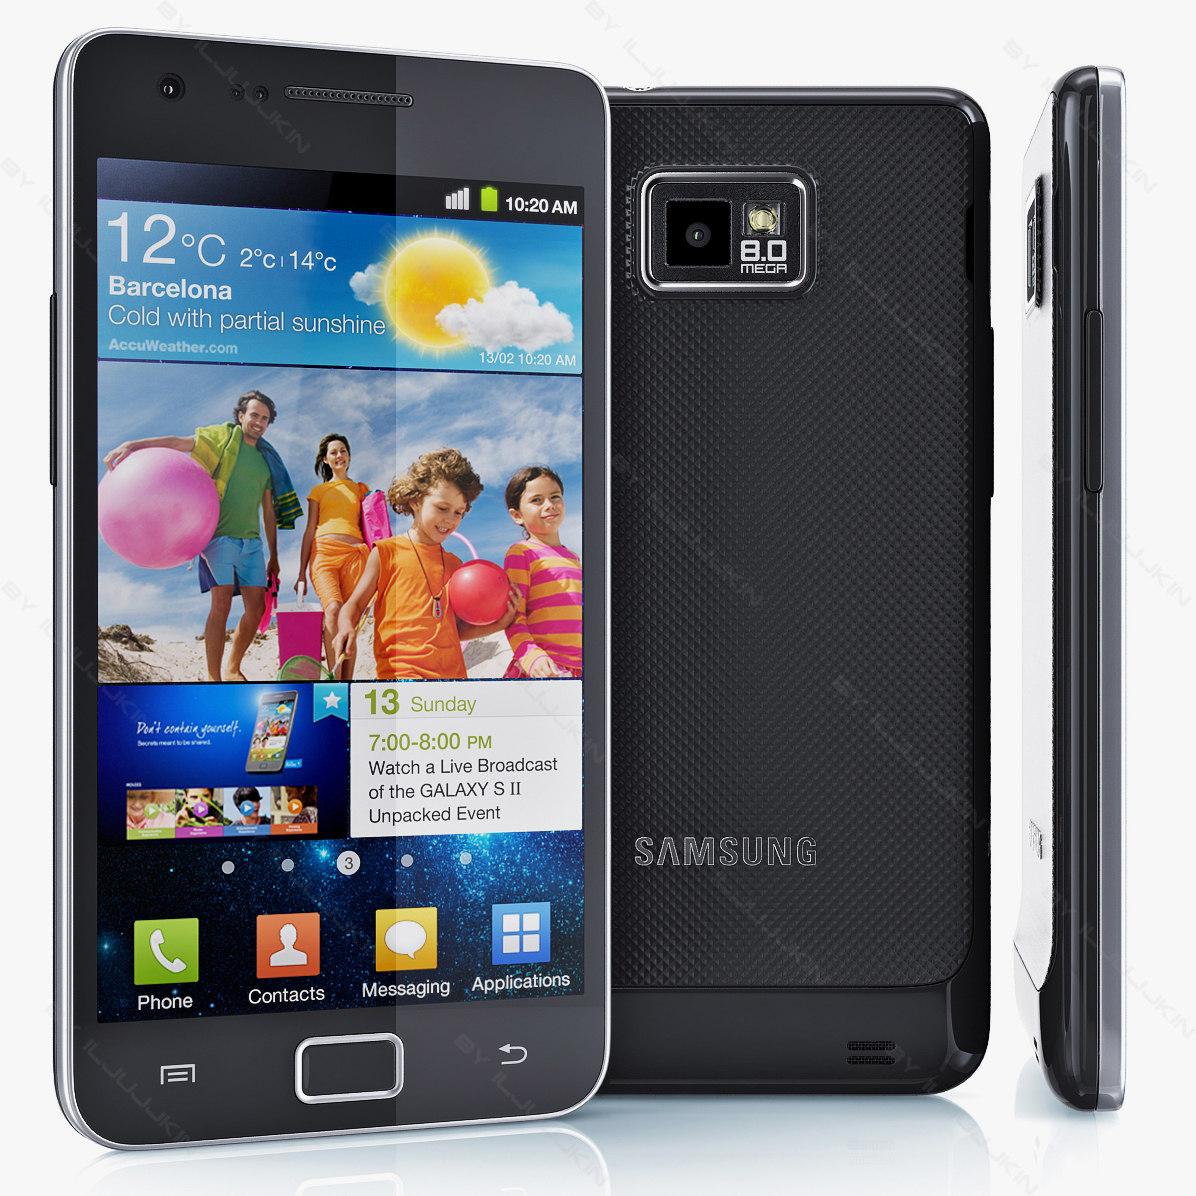 Samsung_galaxy_i9100_01.jpg